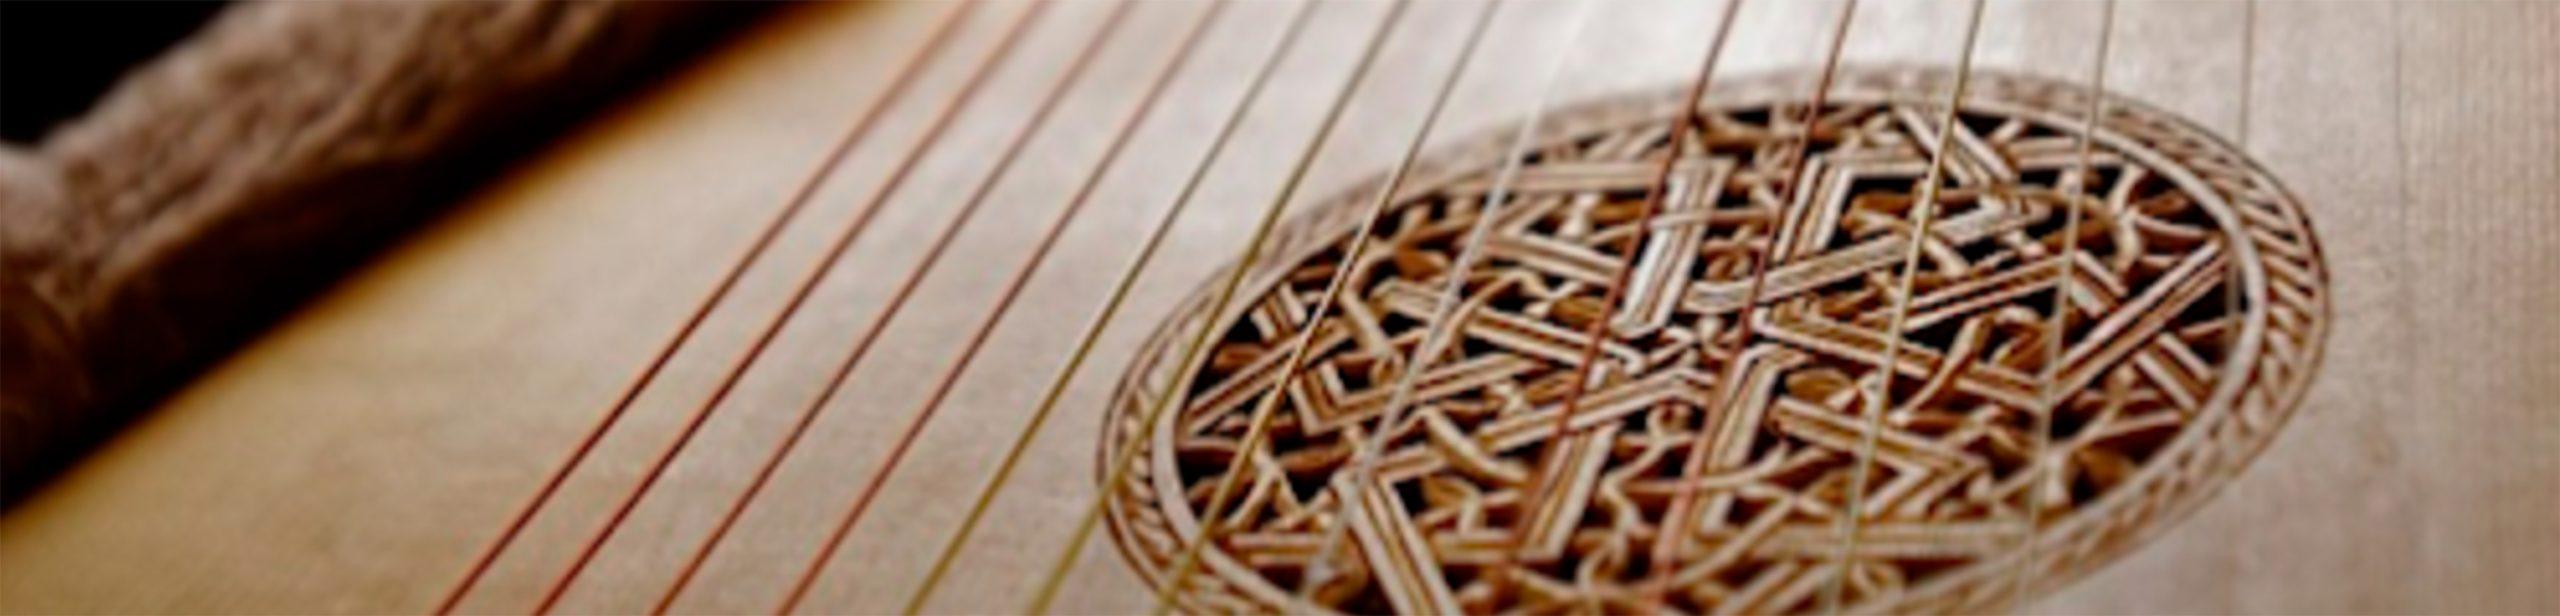 Convocatoria – Asistente de grabación de disco de música antigua